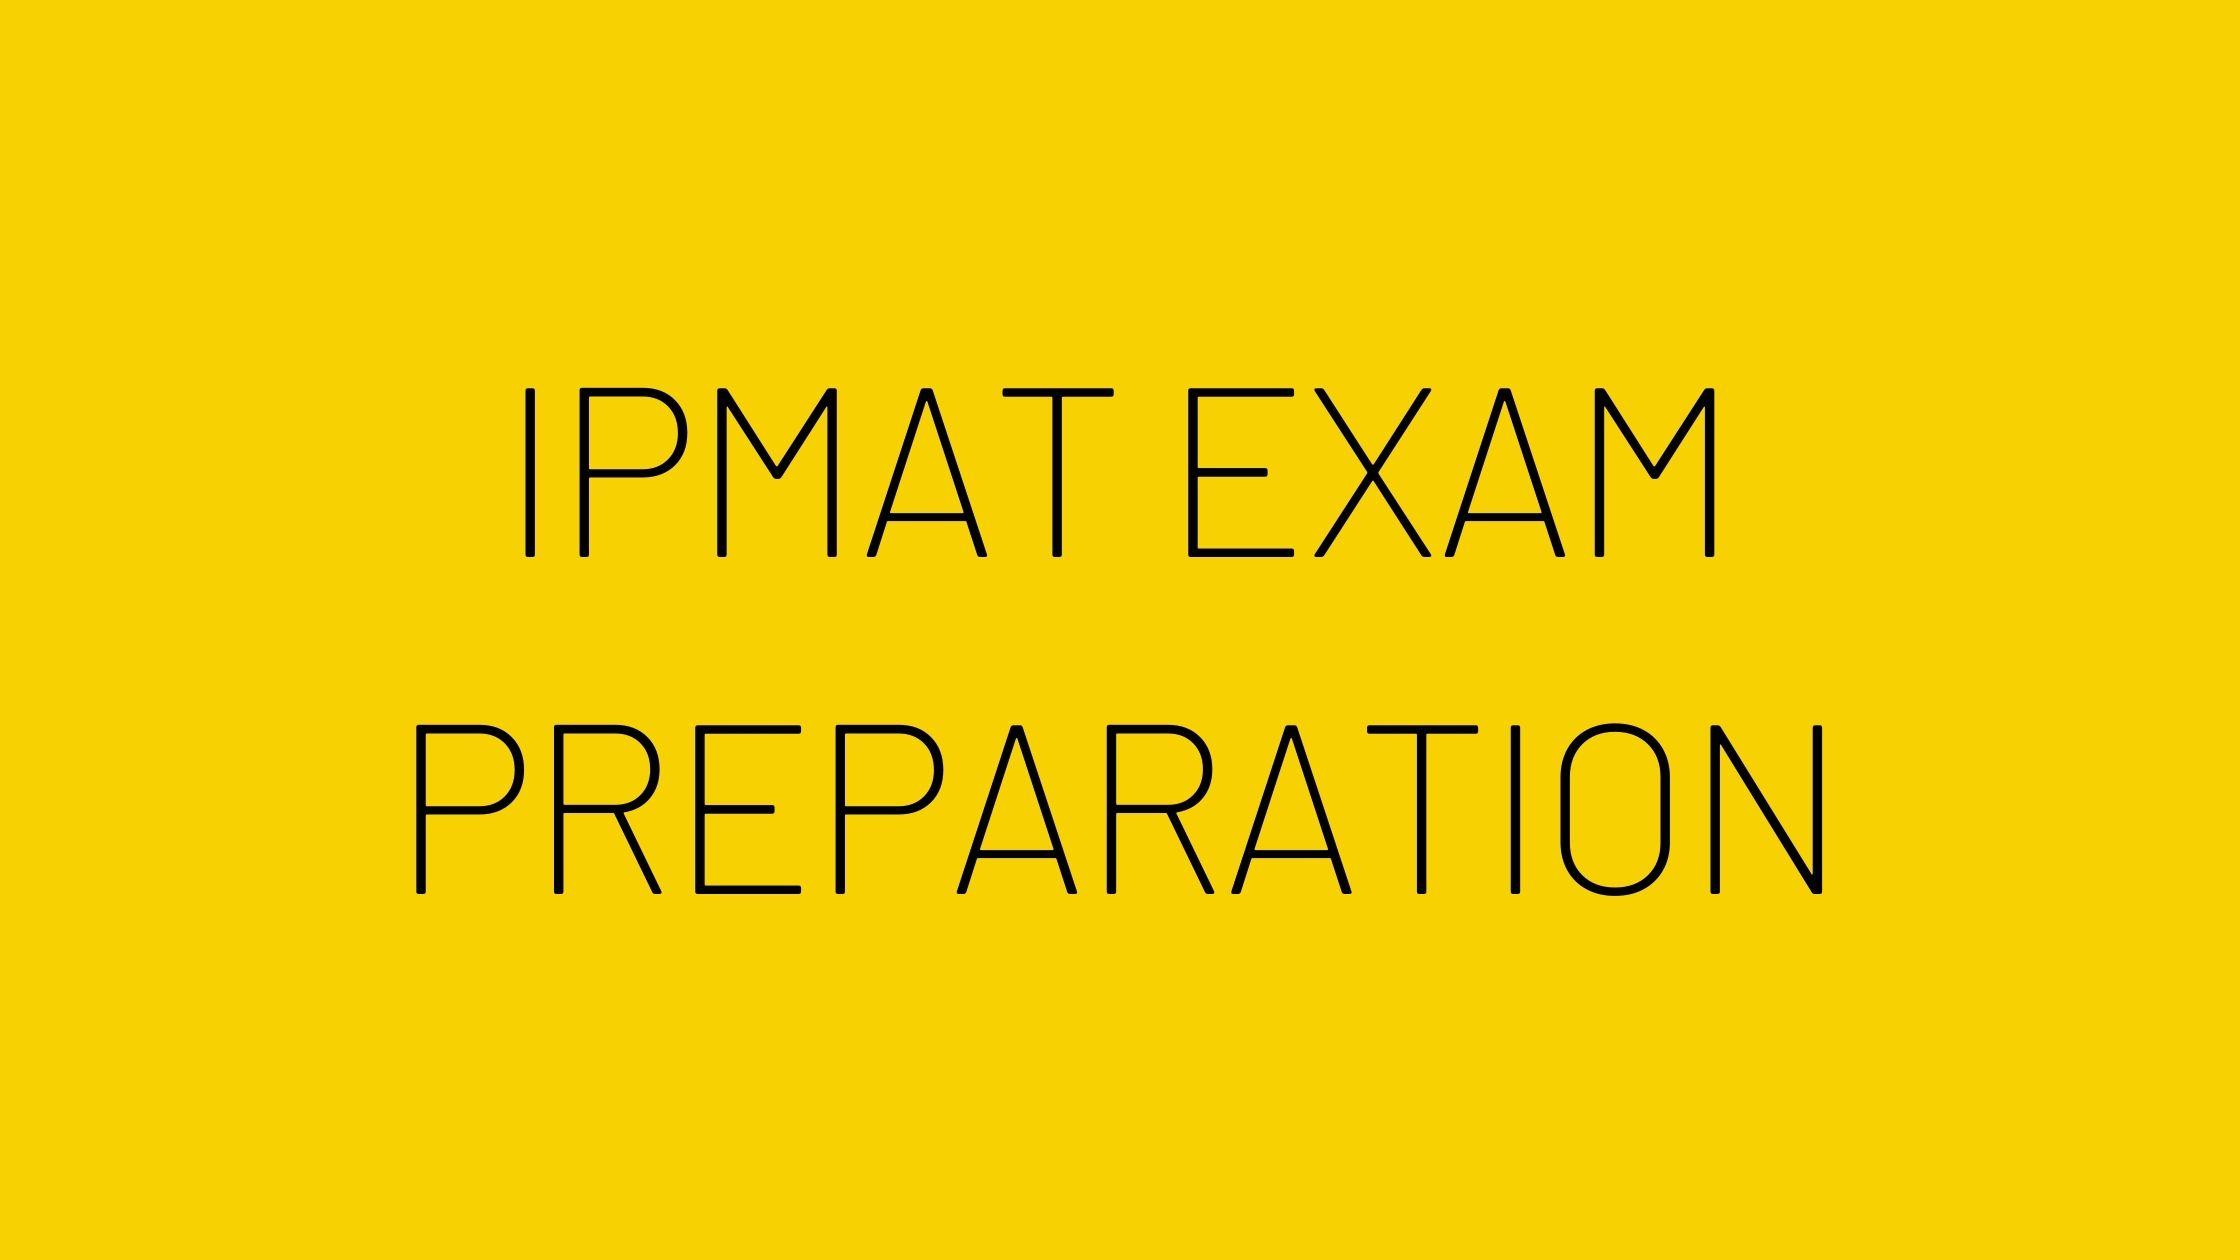 Best IPMAT Exam Preparation Tips 2021: Study Plan, Tips